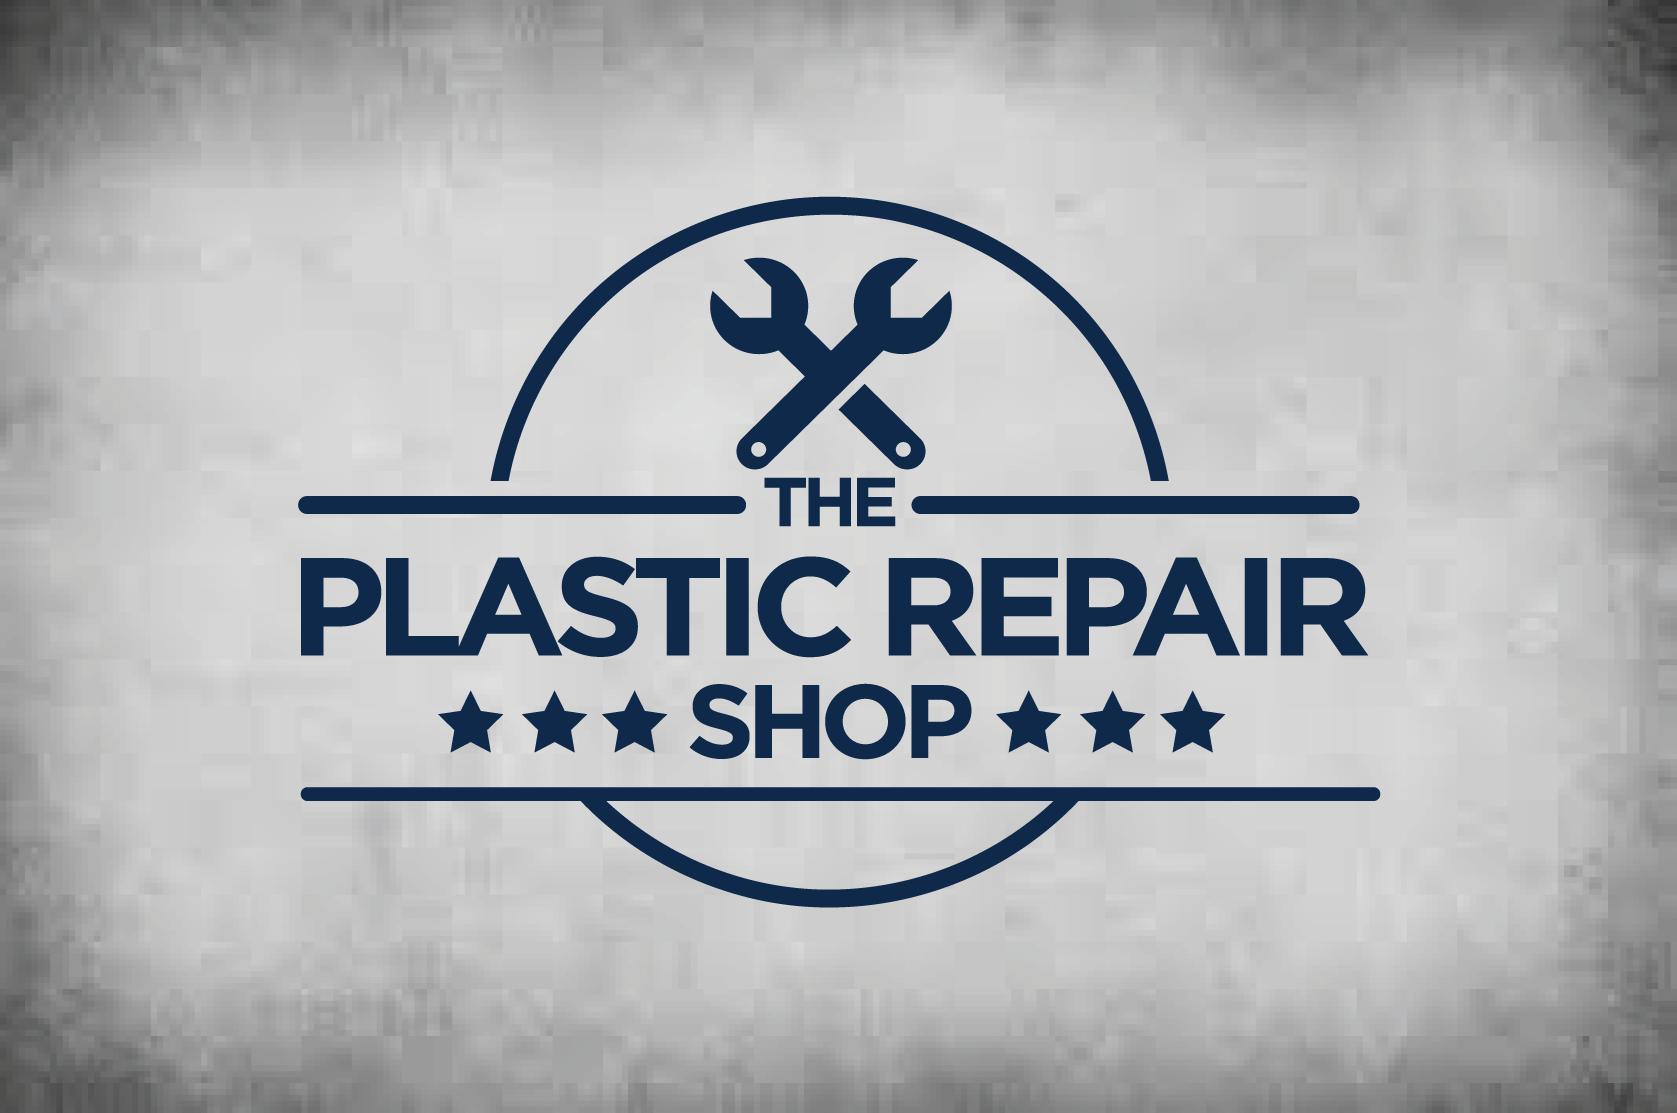 The Plastic Repair Shop